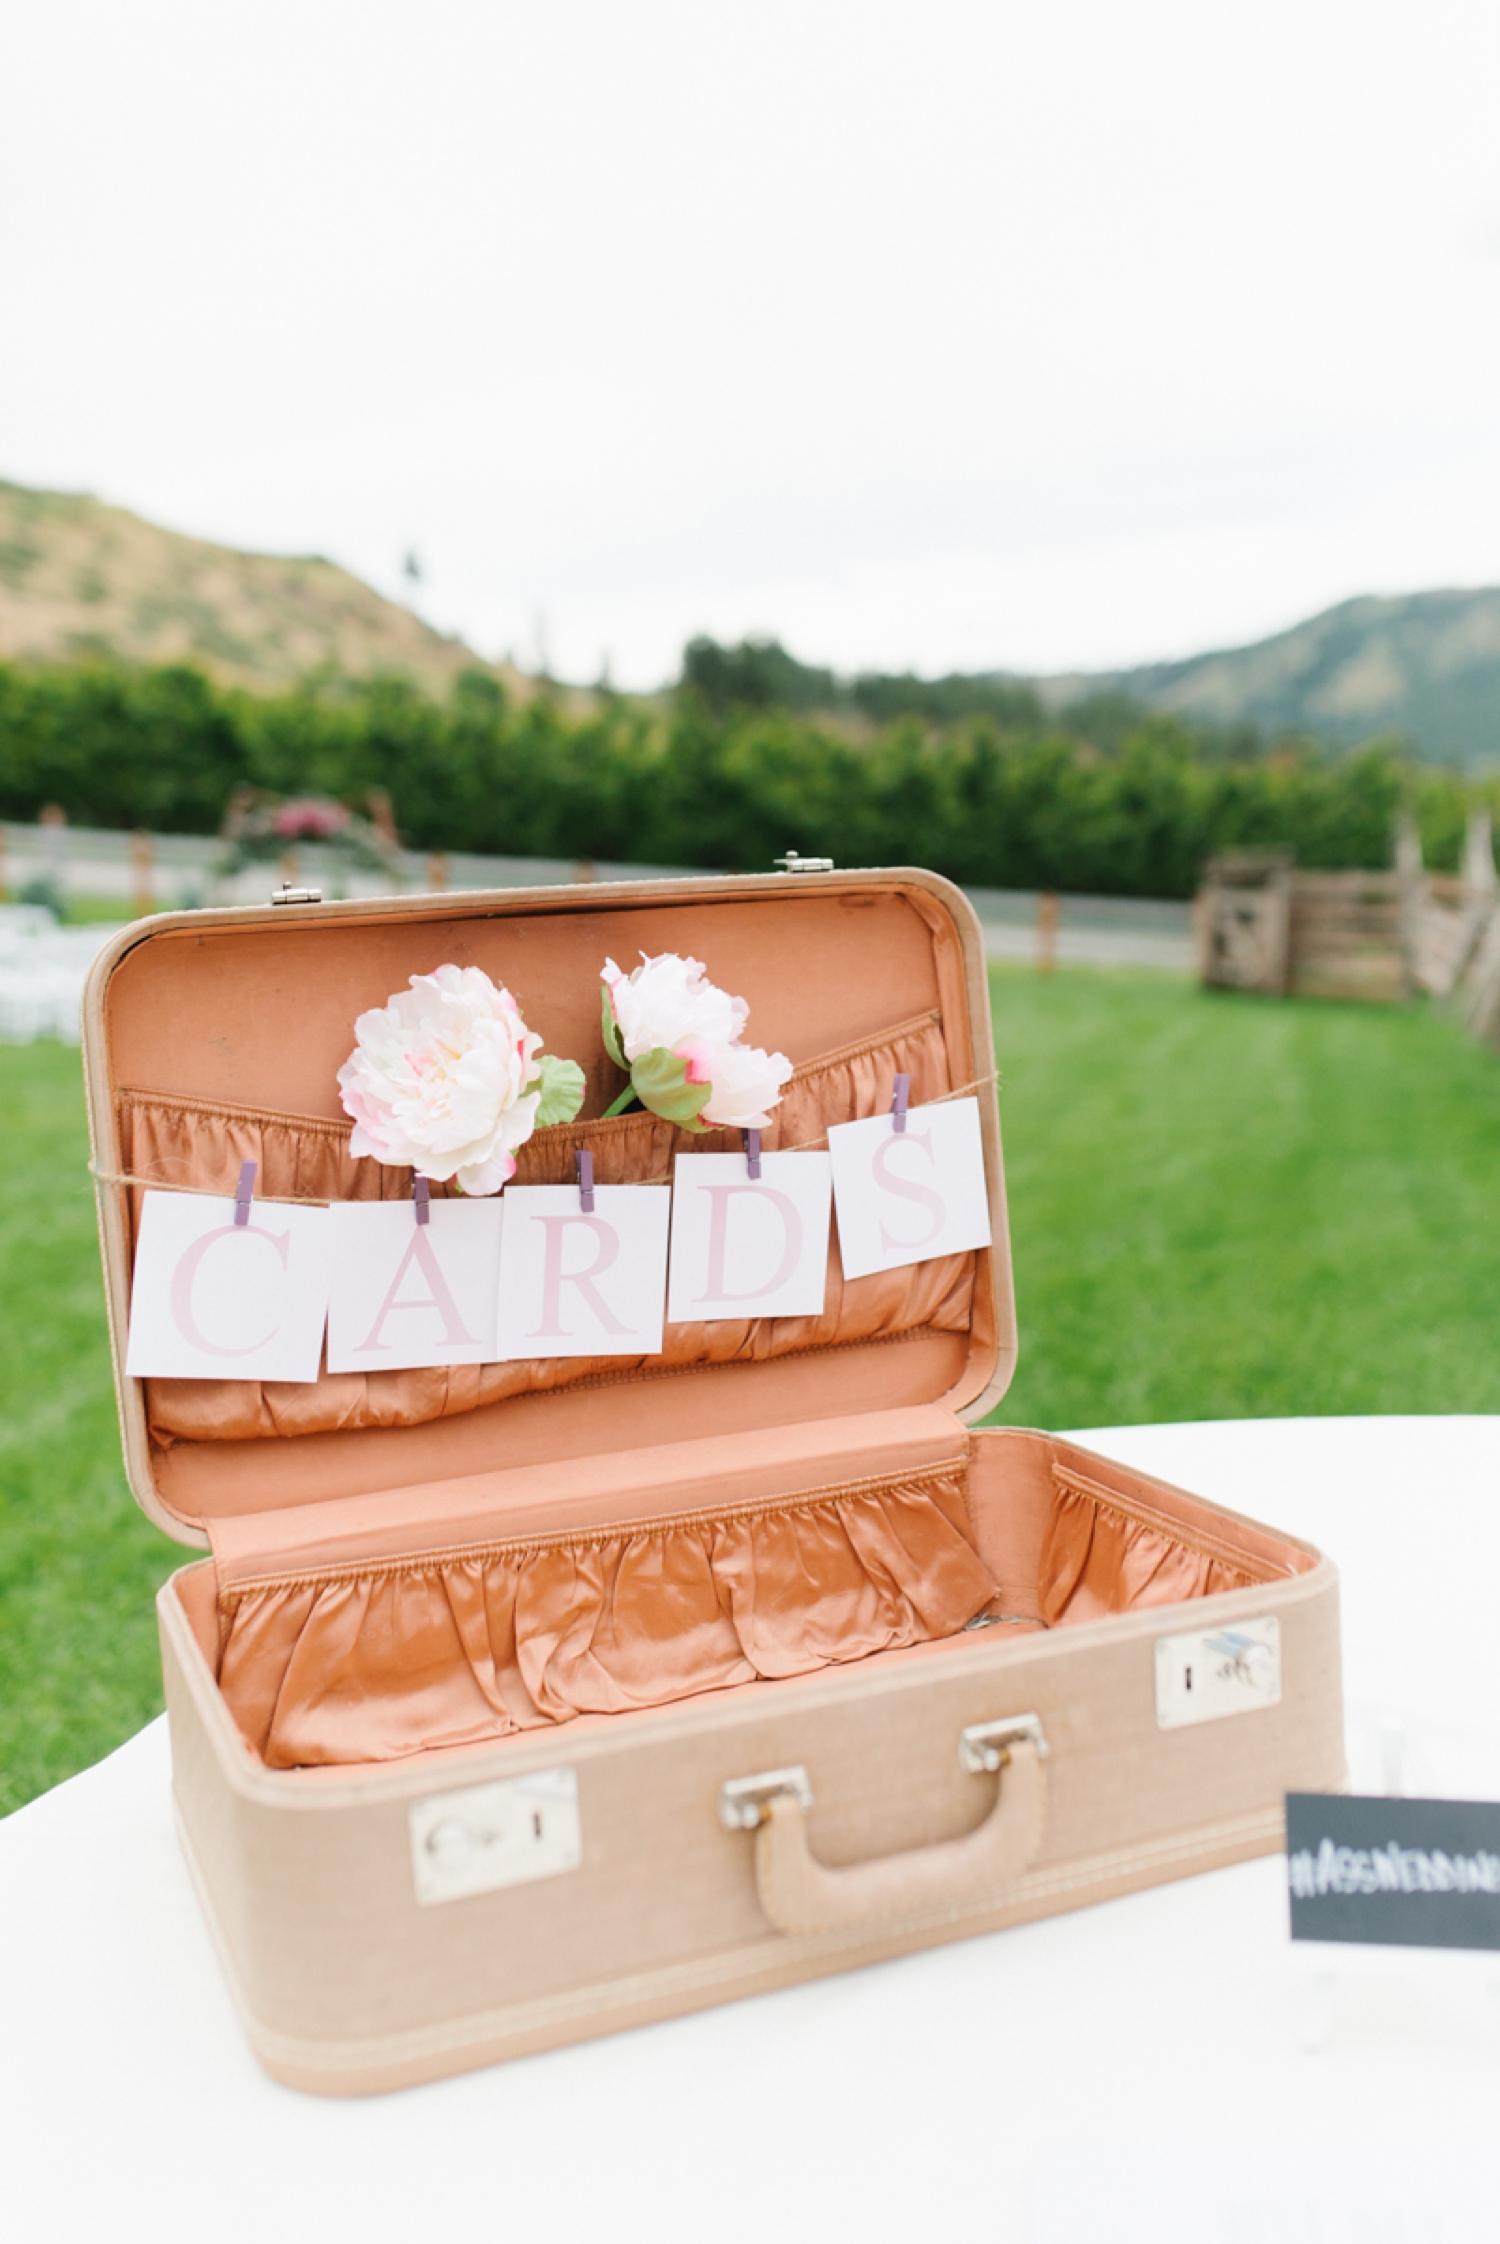 Wenatchee Wedding Photographer   Hampton Hideaway   Summer Rustic Wedding Eastern Washington   Emma Rose Company   Pastel Wedding Inspiration   Lace Wedding   Pacific Northwest Wedding 62.jpg